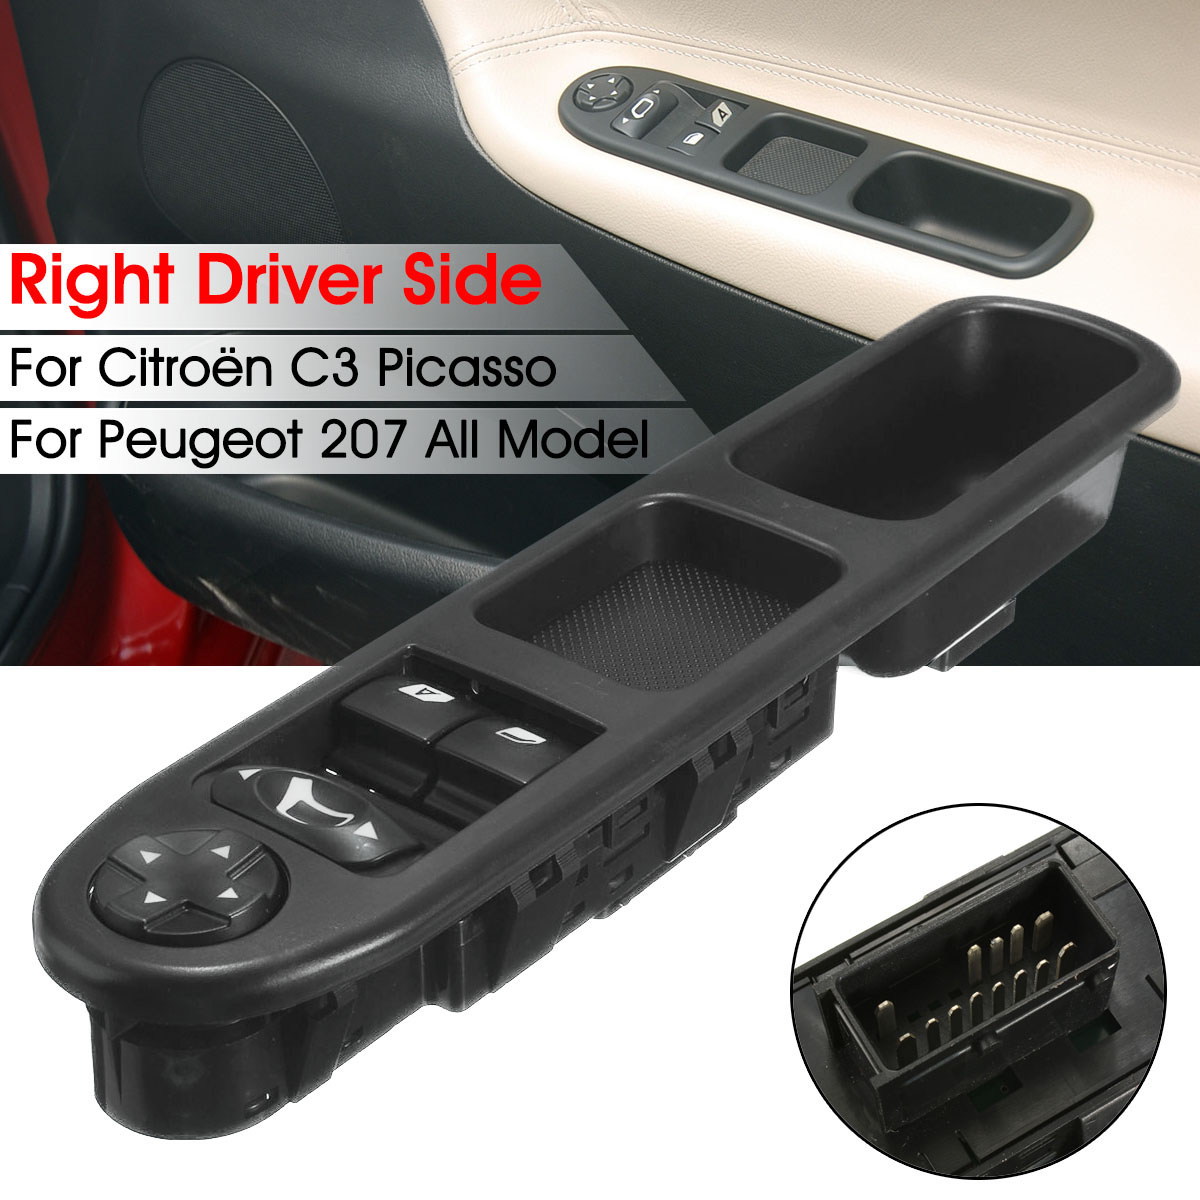 6554.QC ön sol sürücü yan güç ana pencere kontrol anahtarı 6554QC Peugeot 207 Citroen C3 Picasso 2007- 2014